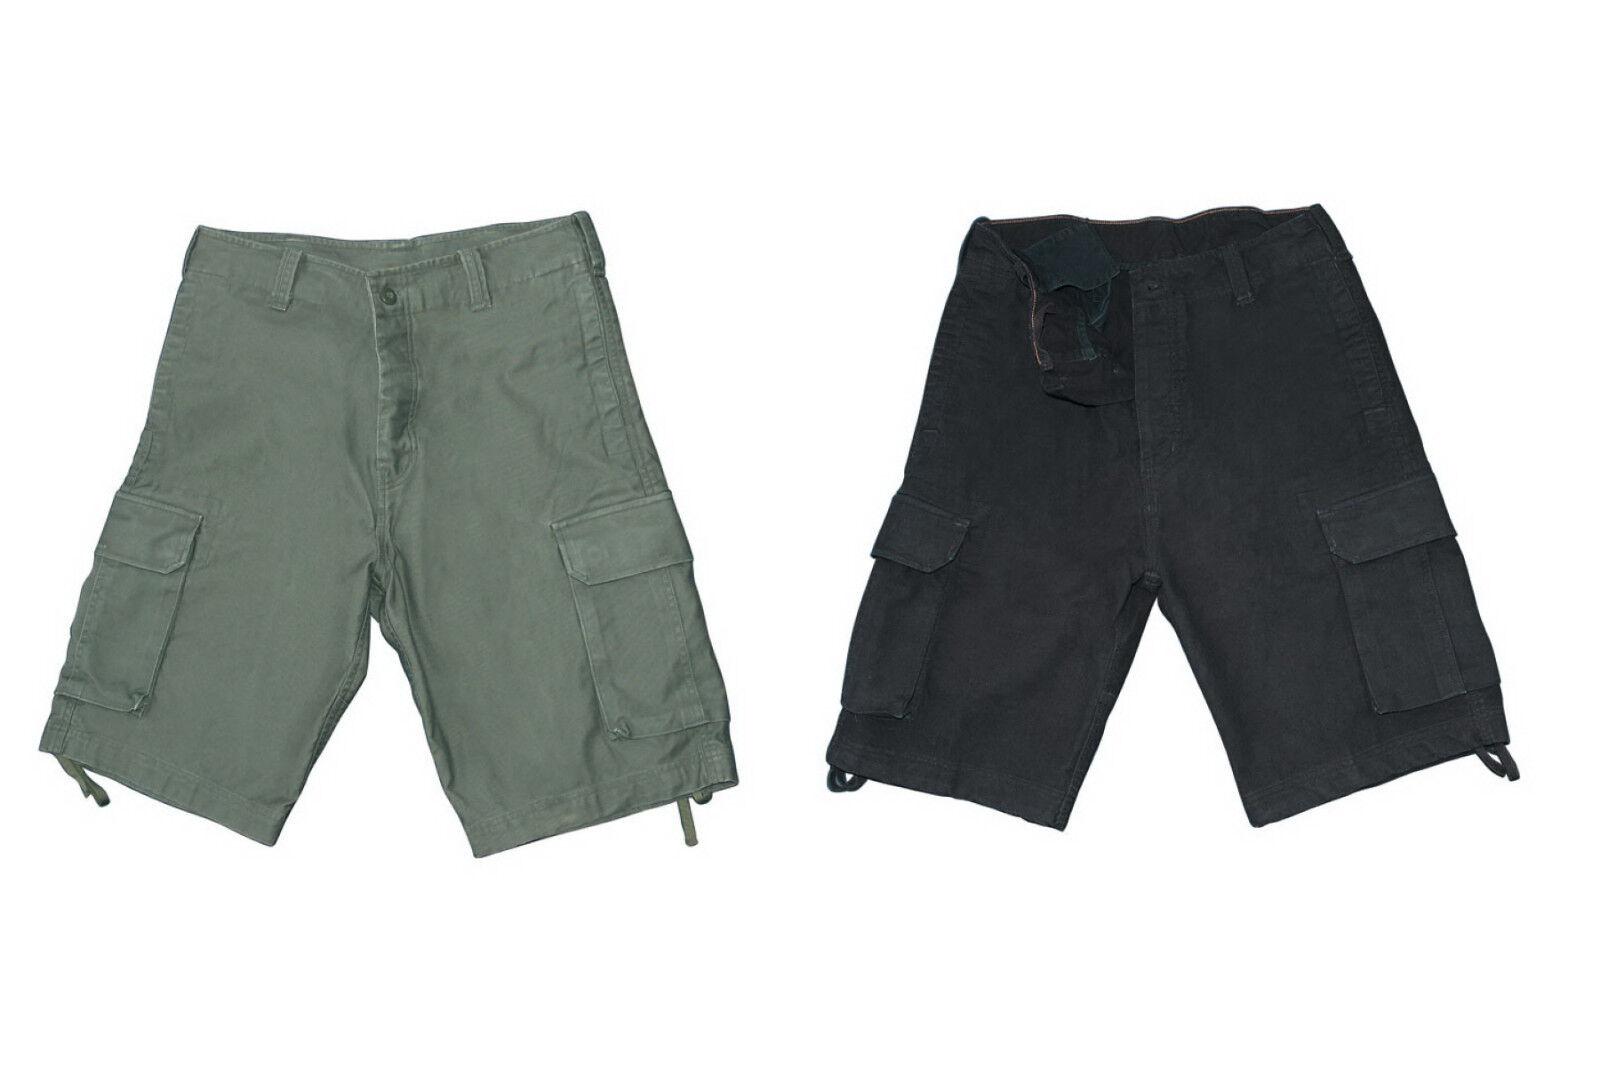 Army Bermuda Vintage-Shorts aus robustem Moleskingewebe kurze Hose S M L XL XXL